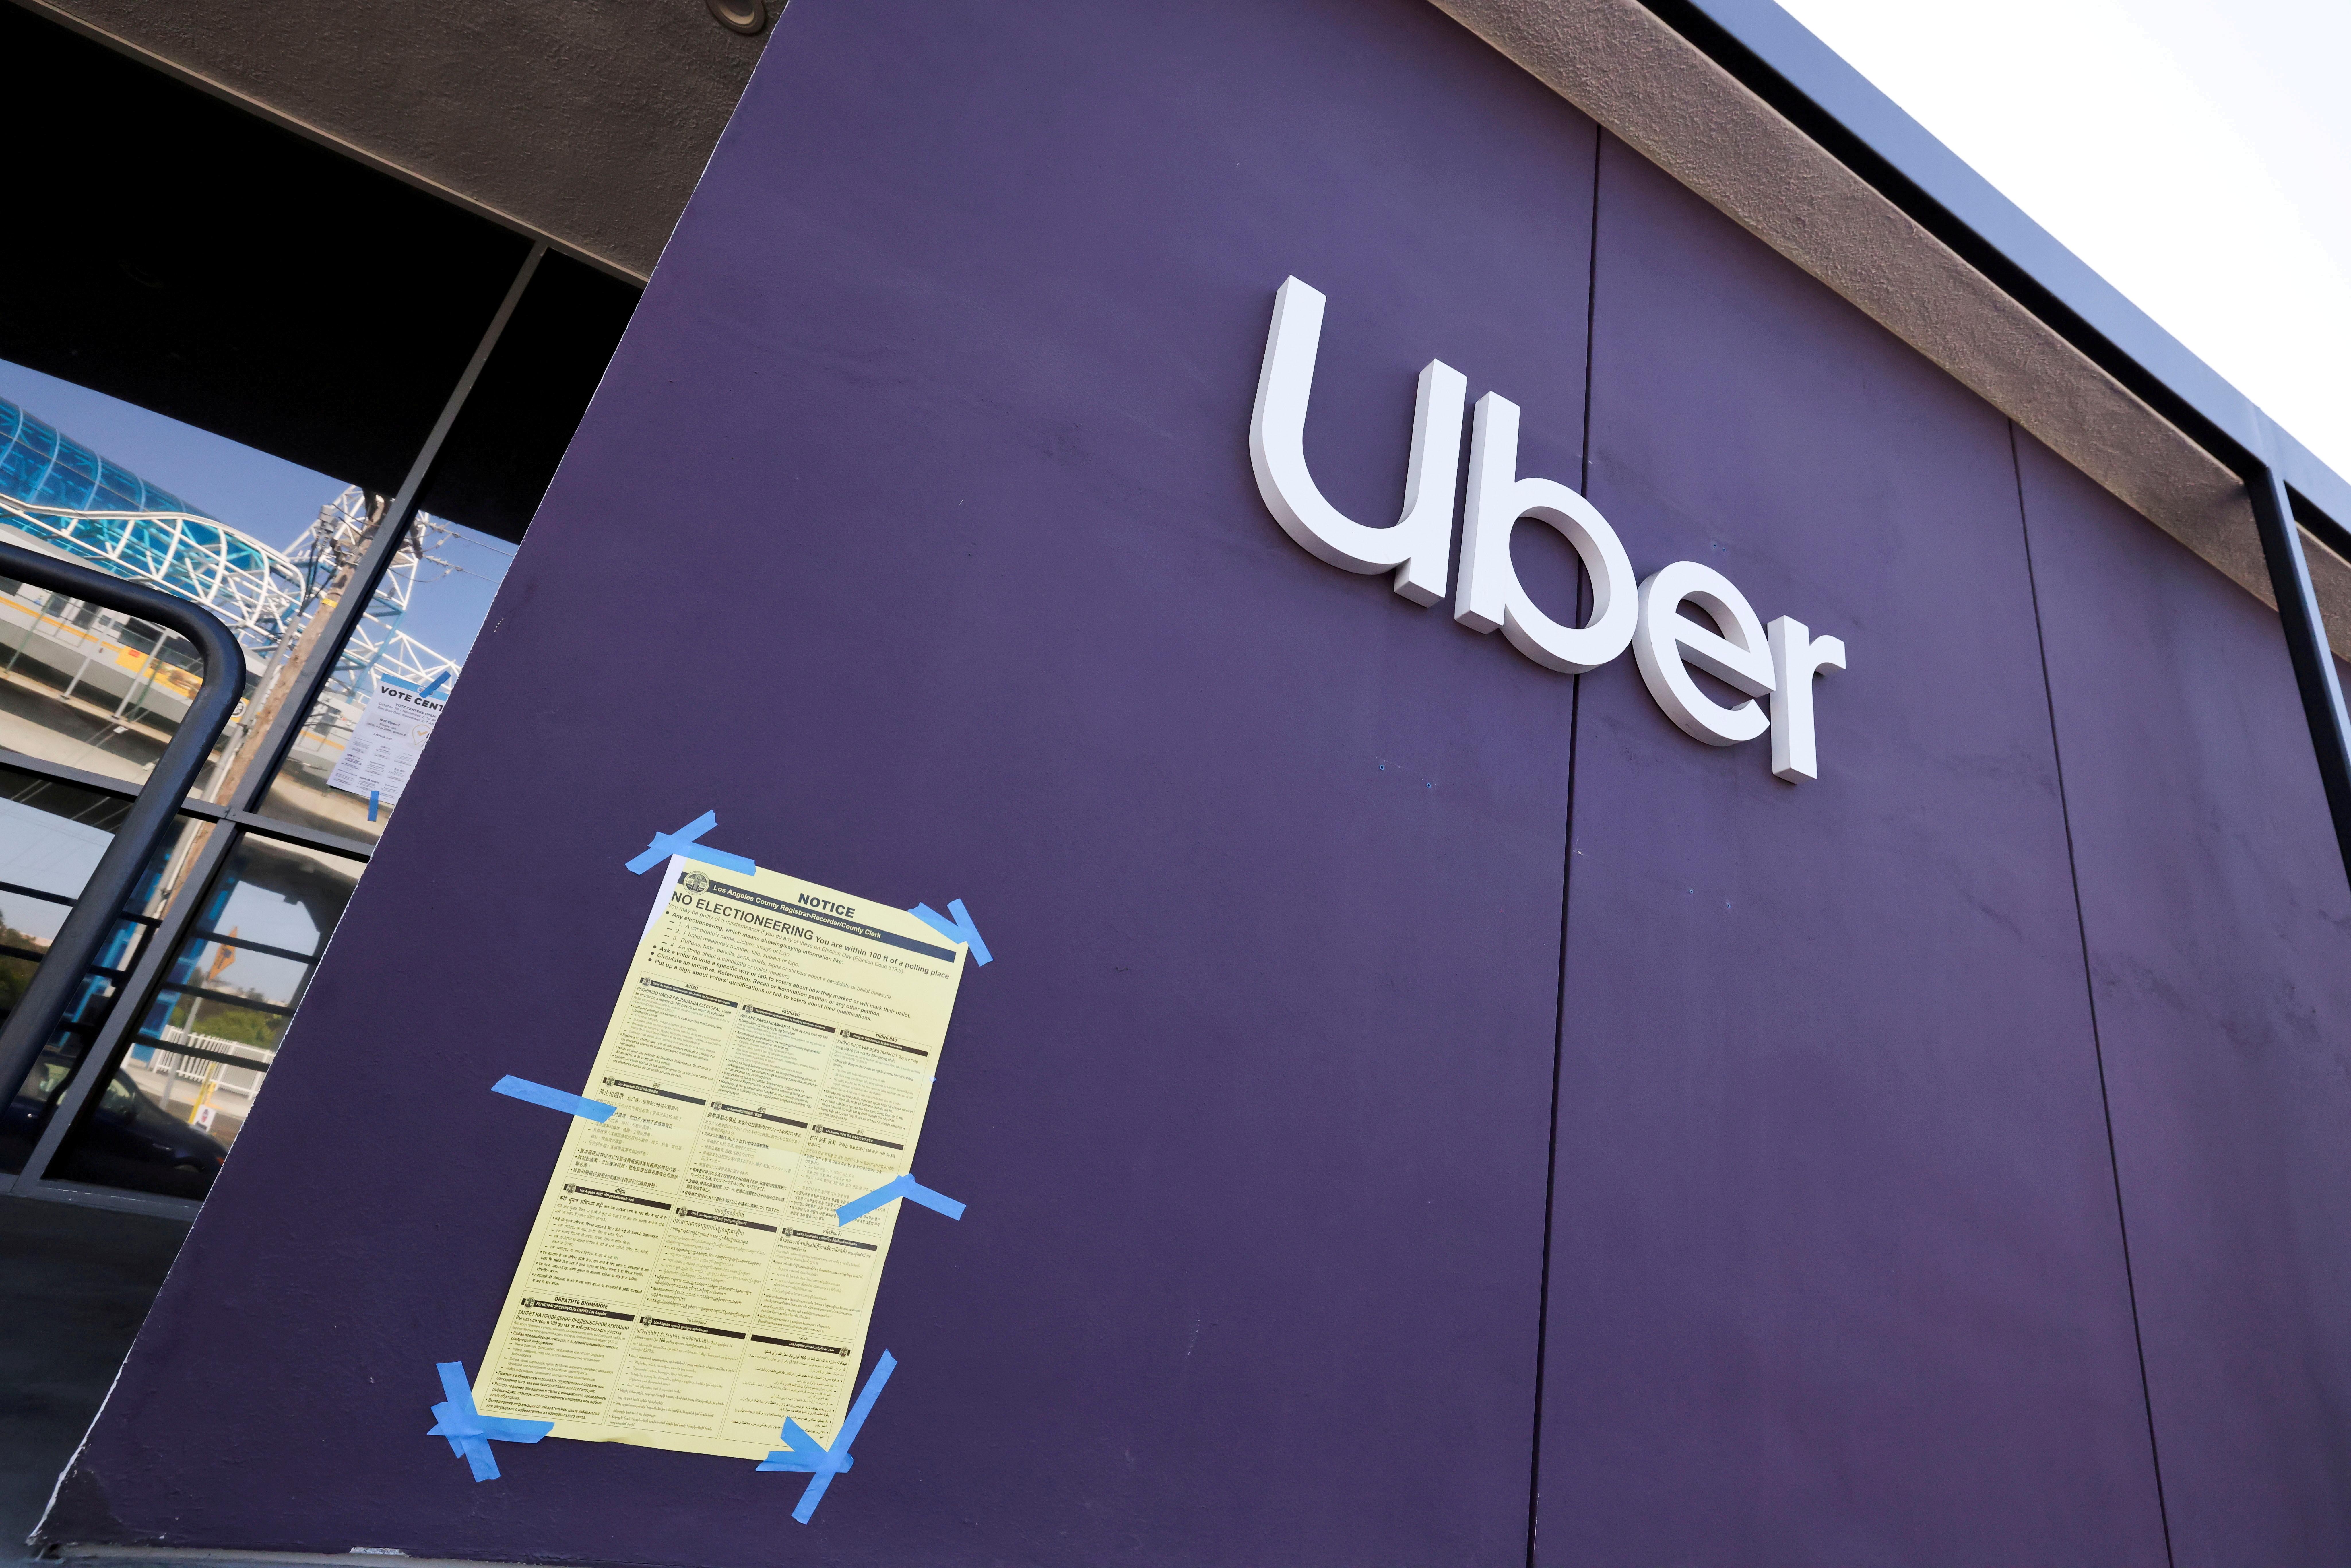 An Uber logo is seen during the global outbreak of the coronavirus disease (COVID-19), in Redondo Beach, Los Angeles, California, U.S., November 2, 2020. REUTERS/Lucy Nicholson